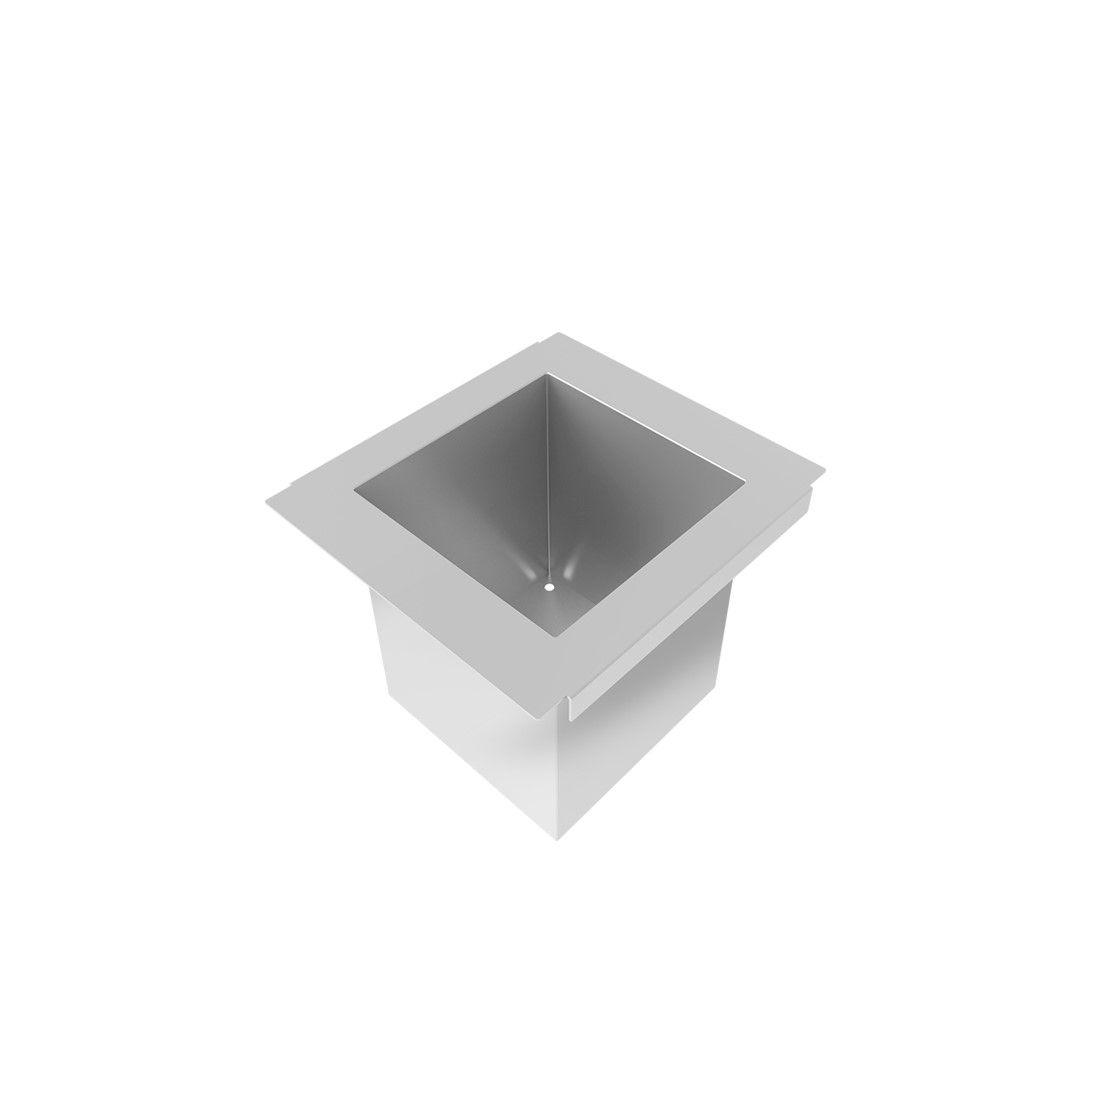 Porta Potes Mini Horta DeBacco Inox 15cm  - Sua Casa Gourmet e Cia